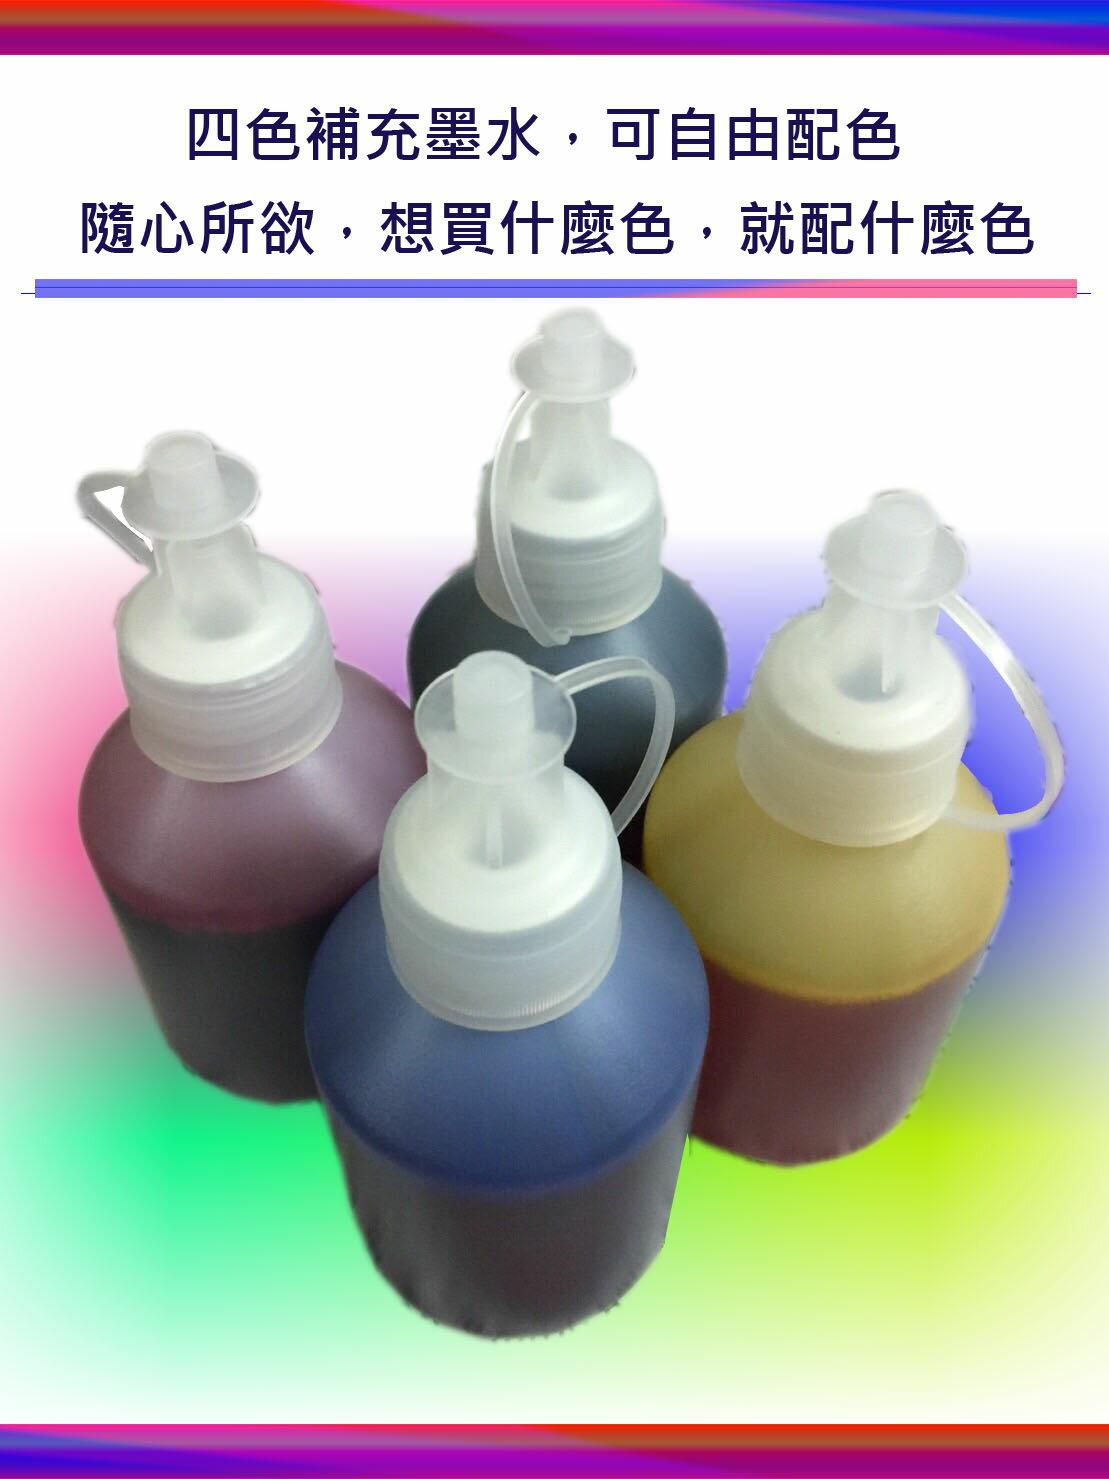 brother 補充墨水 ~ 10瓶優惠組合(可選色) ~ 適用brother 各款噴墨機種~ MFC-J450DW/J470DWJ650DW/J680DW/J870DW/J875DW/T800W/J..